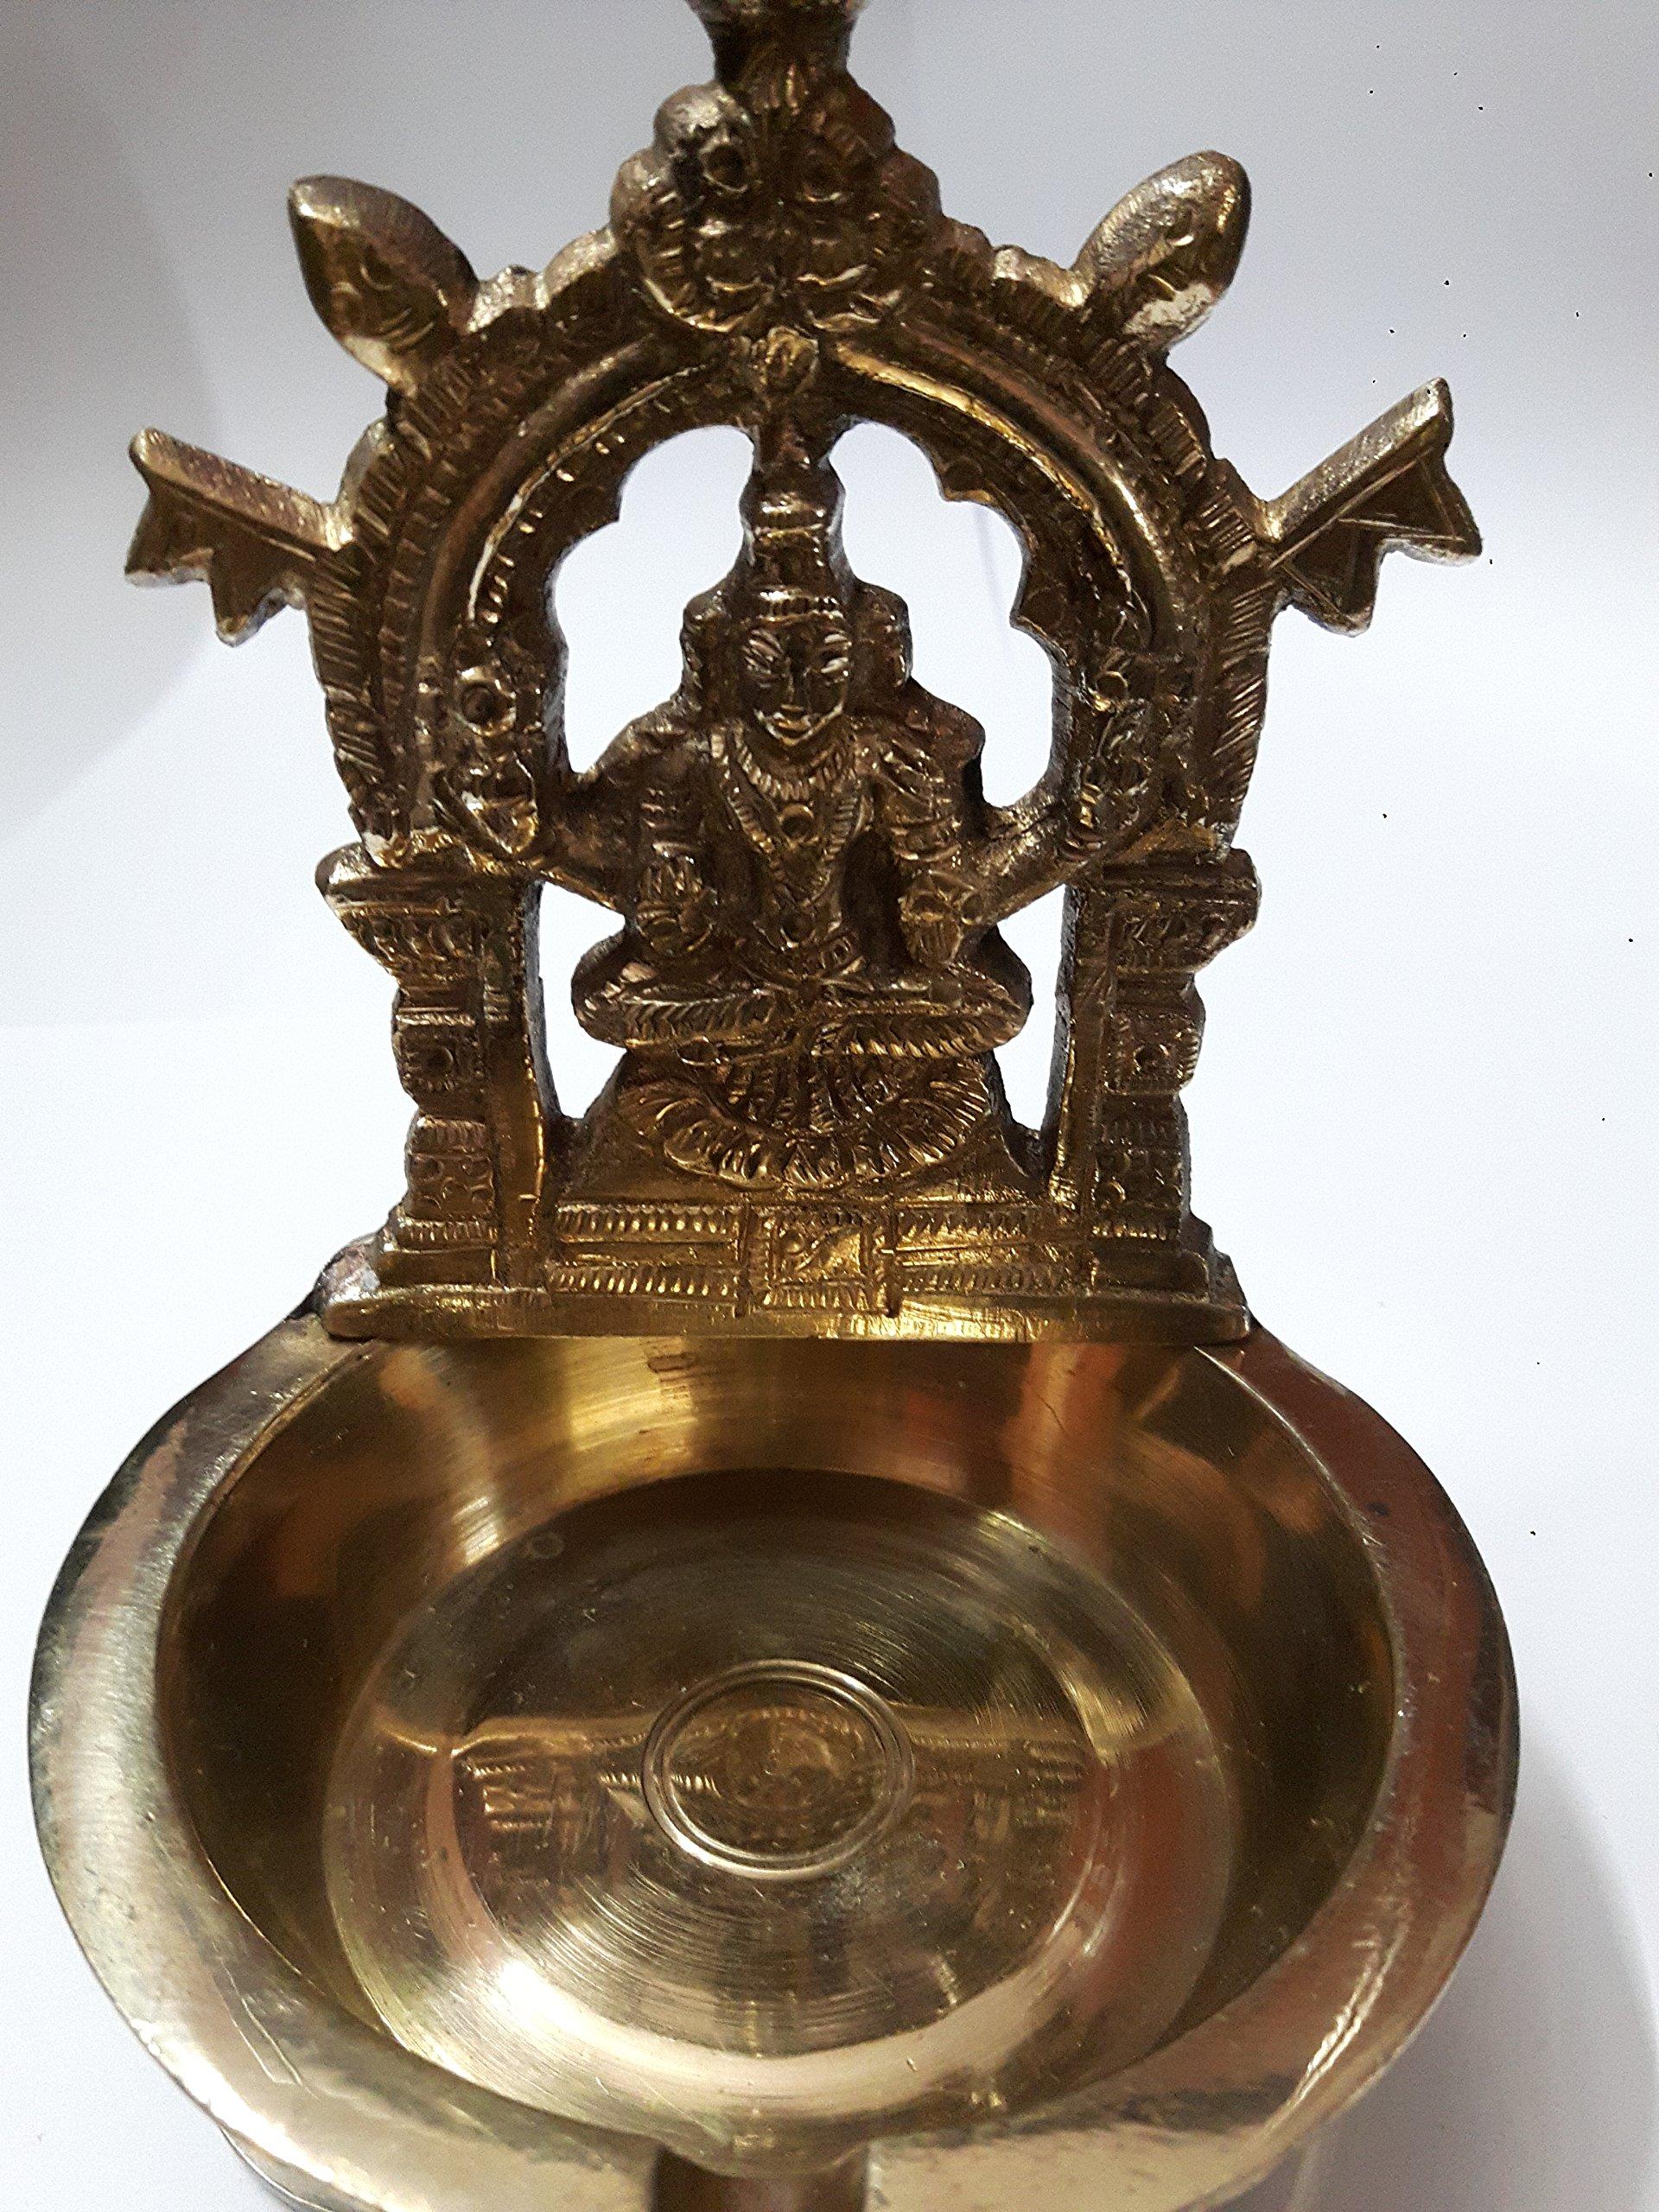 Mookambigai Lamp India Brass Diya Deepak Akhand Jyot Kuber Hindu Temple Havan Puja Religious Oil Lamp (11 cms Height)